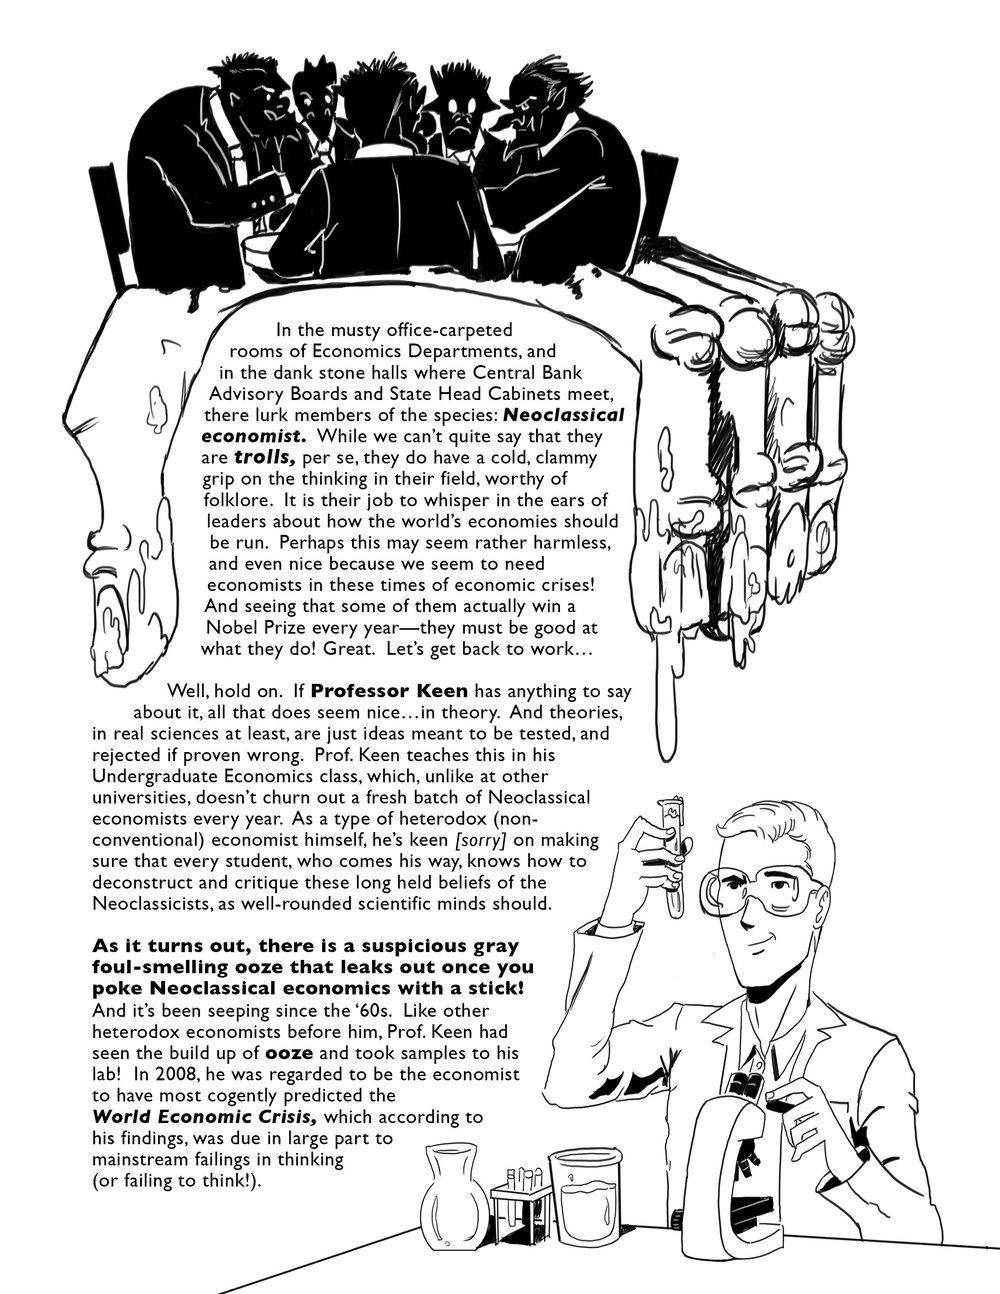 Help create a graphic novel version of Debunking Economics